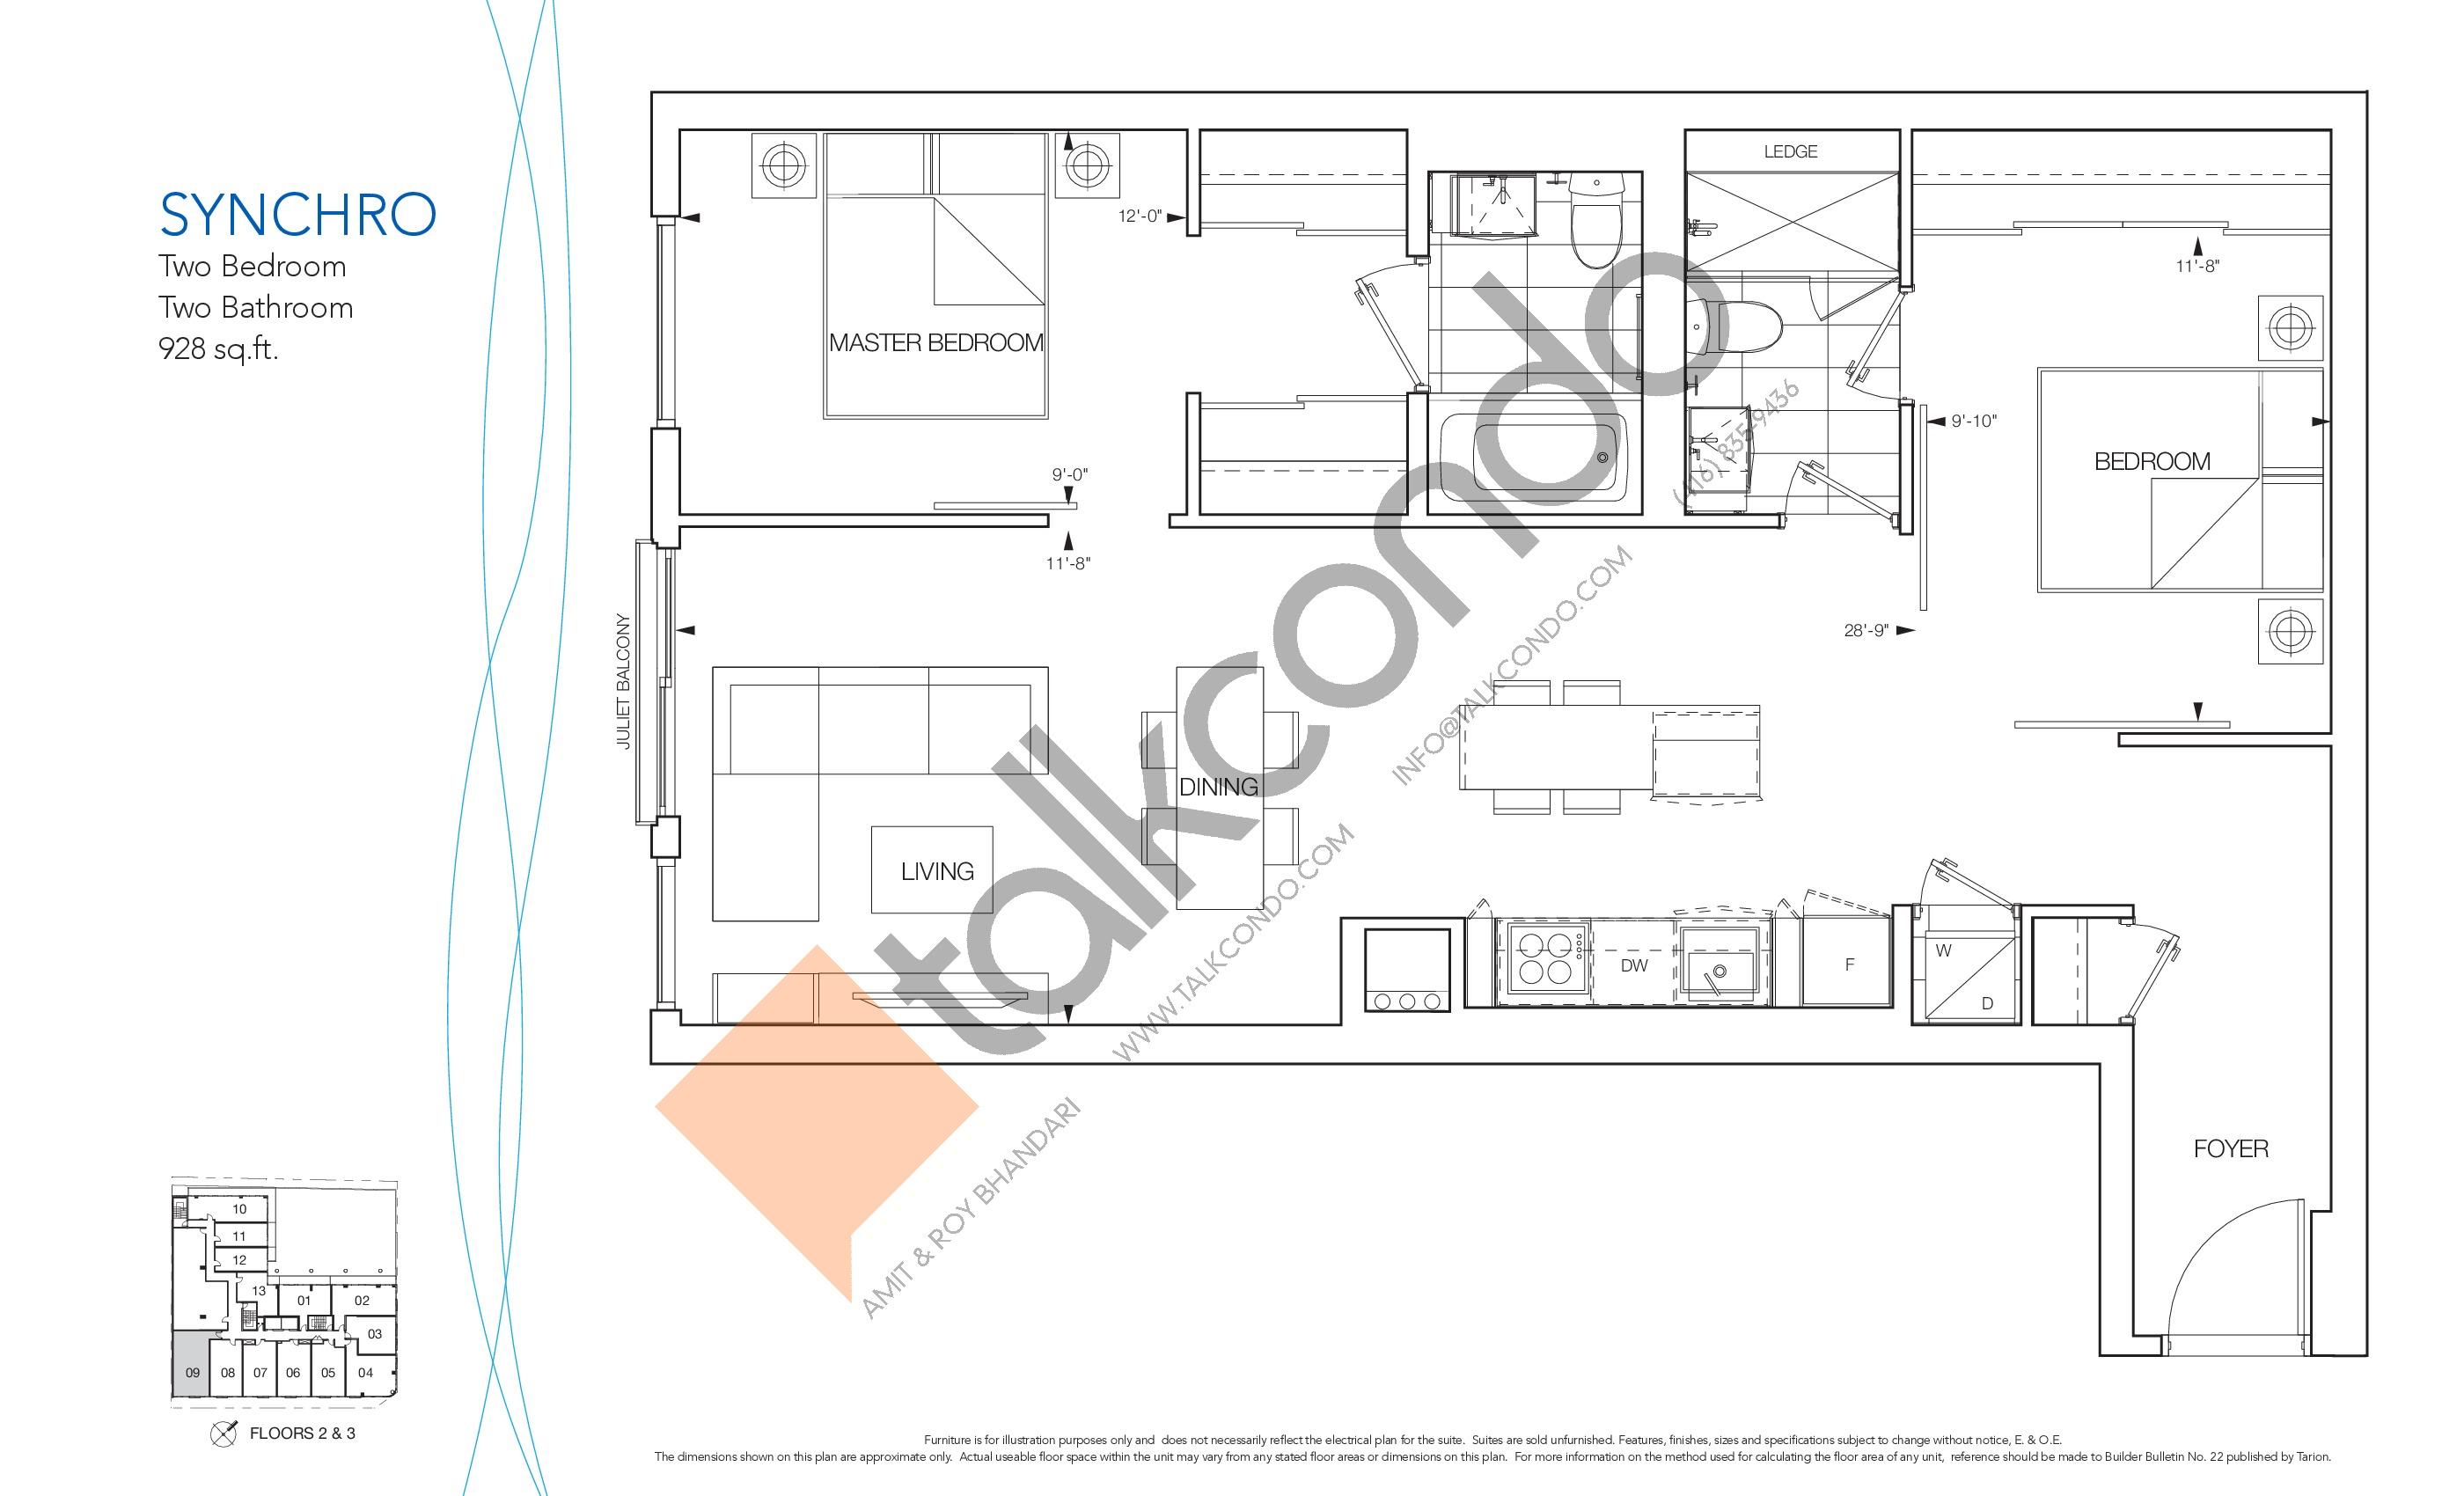 Synchro Floor Plan at Nautique Lakefront Residences - 928 sq.ft